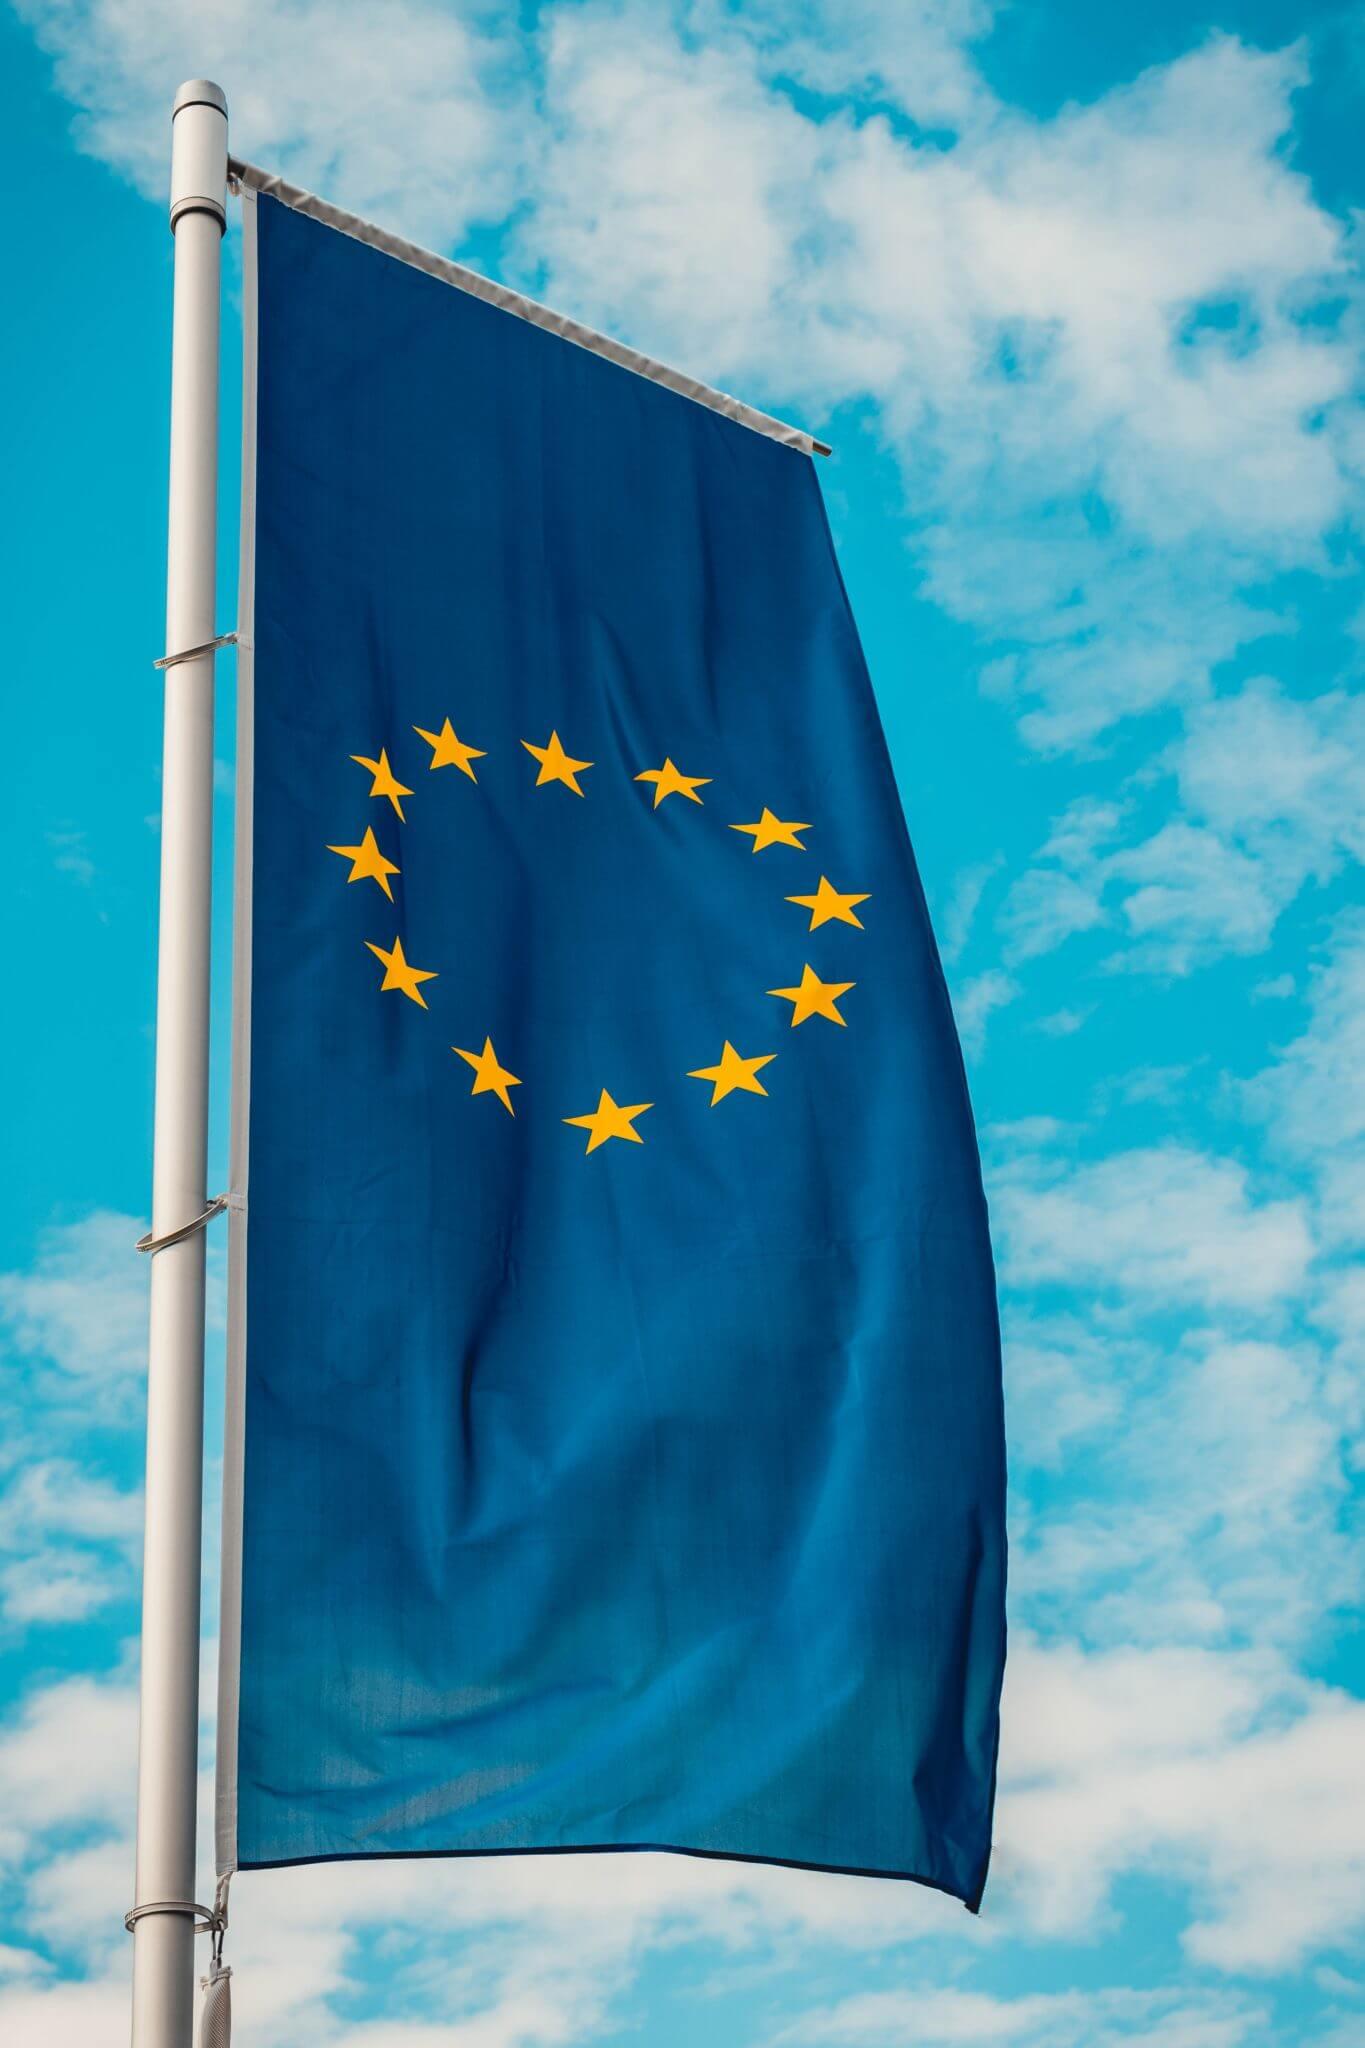 European Flag Photo by Christian Wiediger on Unsplash